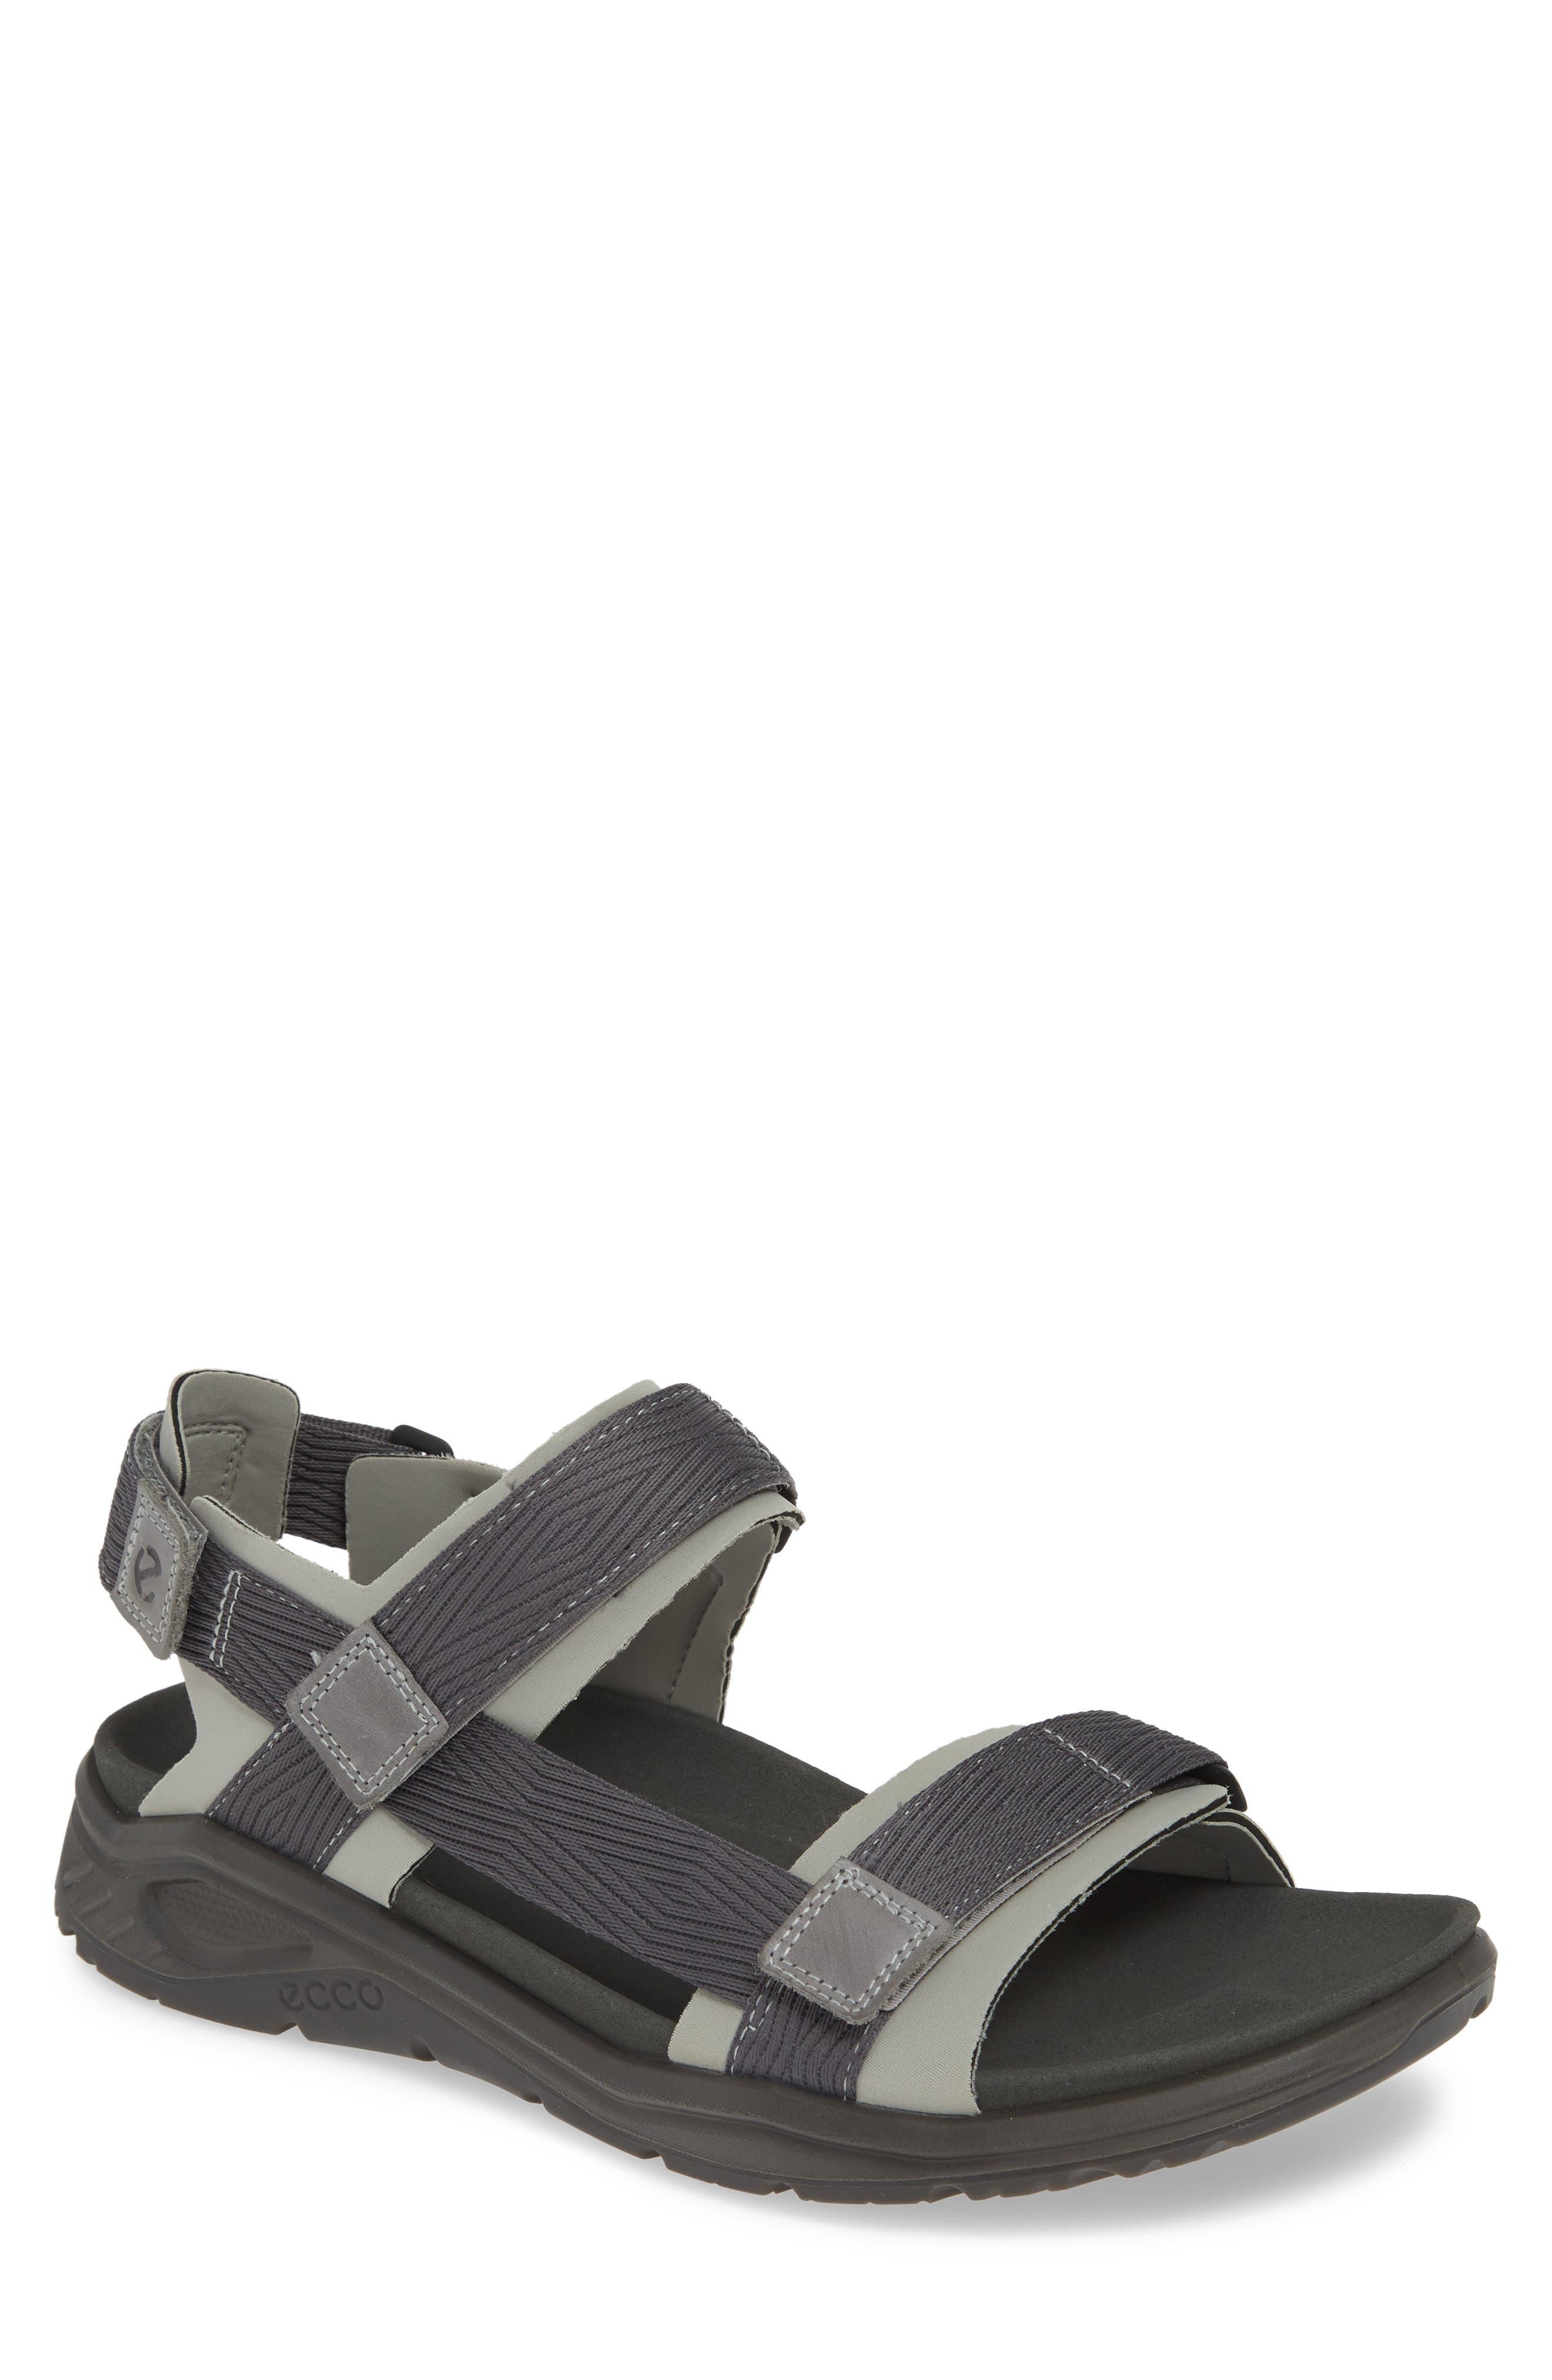 UPC 809704915845 product image for Men's Ecco X-Trinsic Sandal, Size 13-13.5US / 47EU - Grey | upcitemdb.com